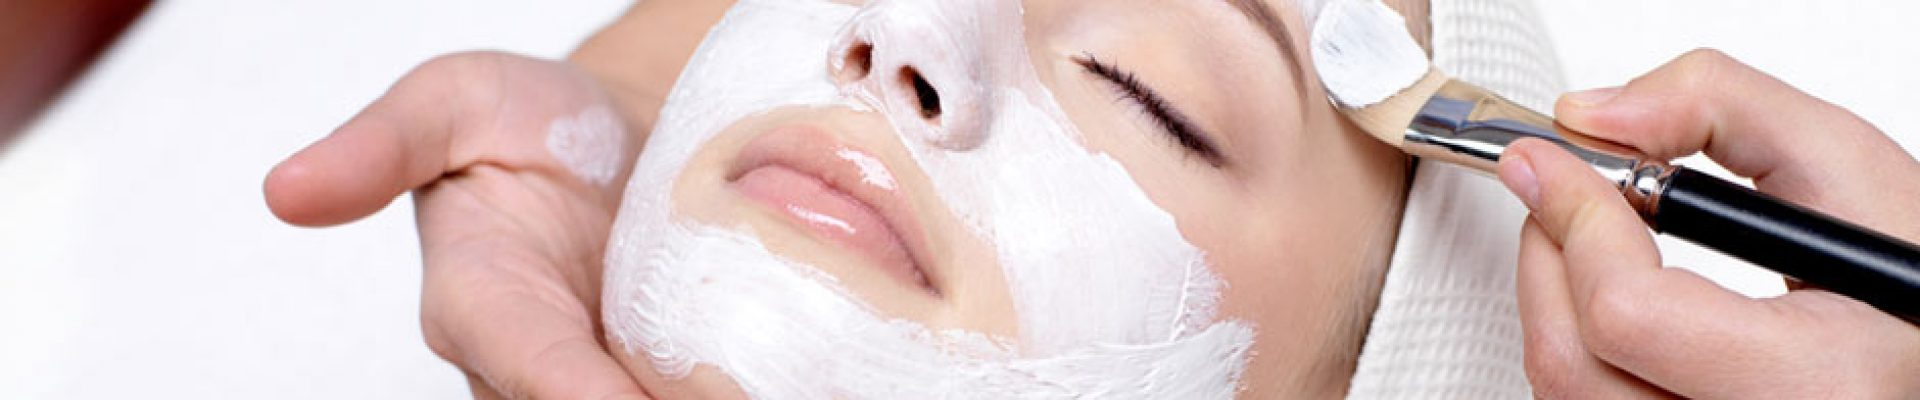 olijf-skincare-behandeling5